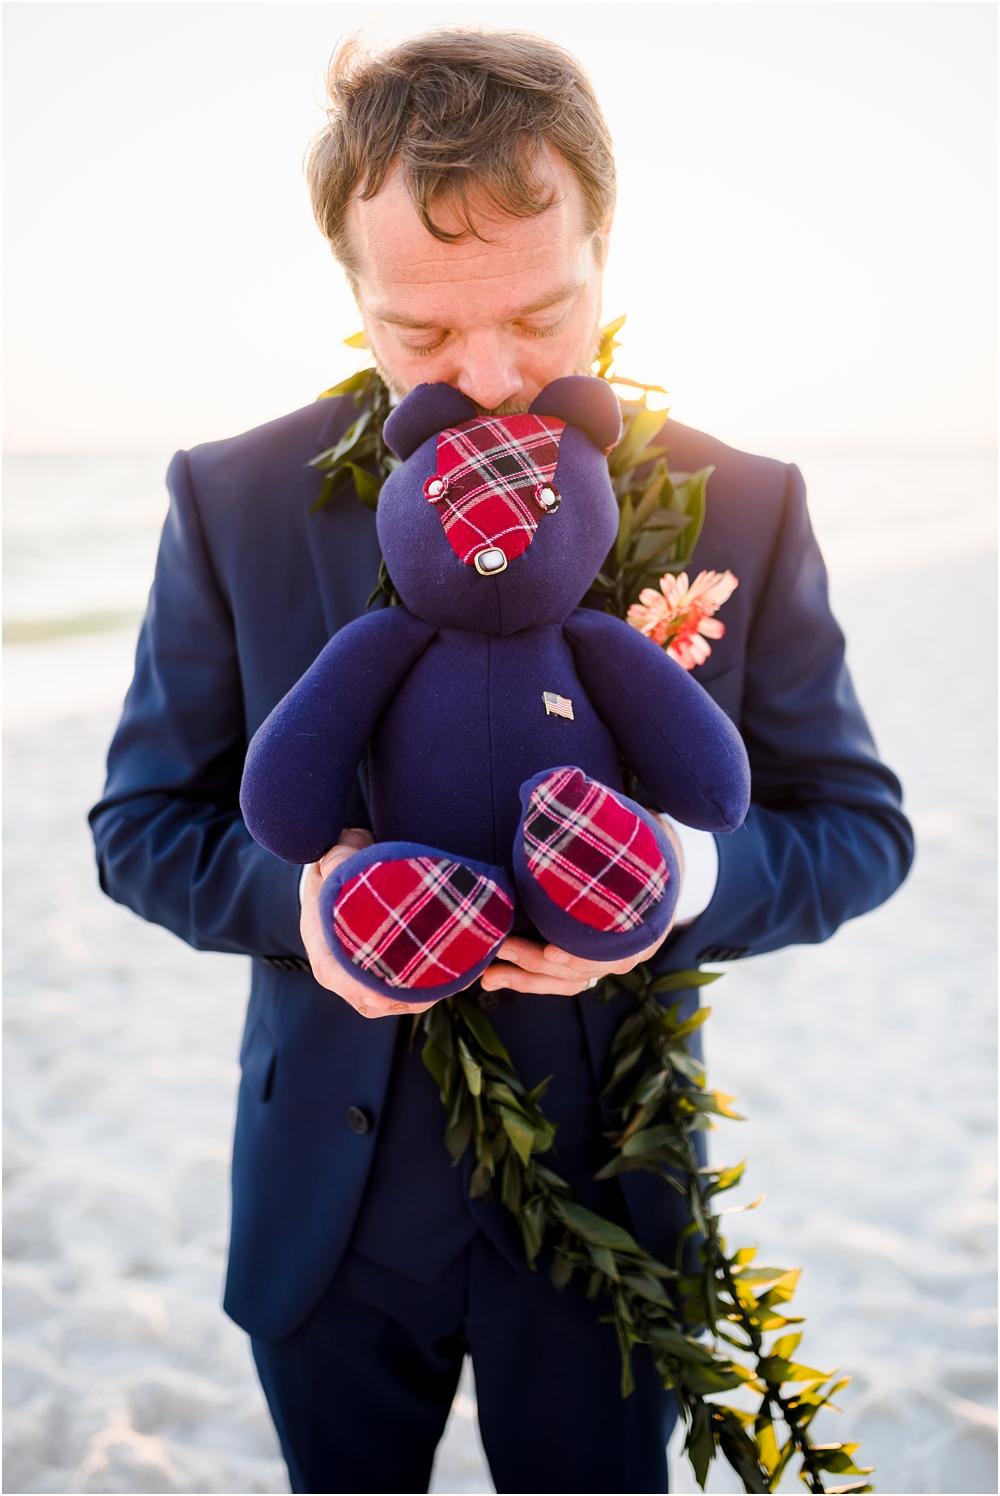 ledman-wedding-kiersten-stevenson-photography-30a-panama-city-beach-dothan-tallahassee-(497-of-763).JPG